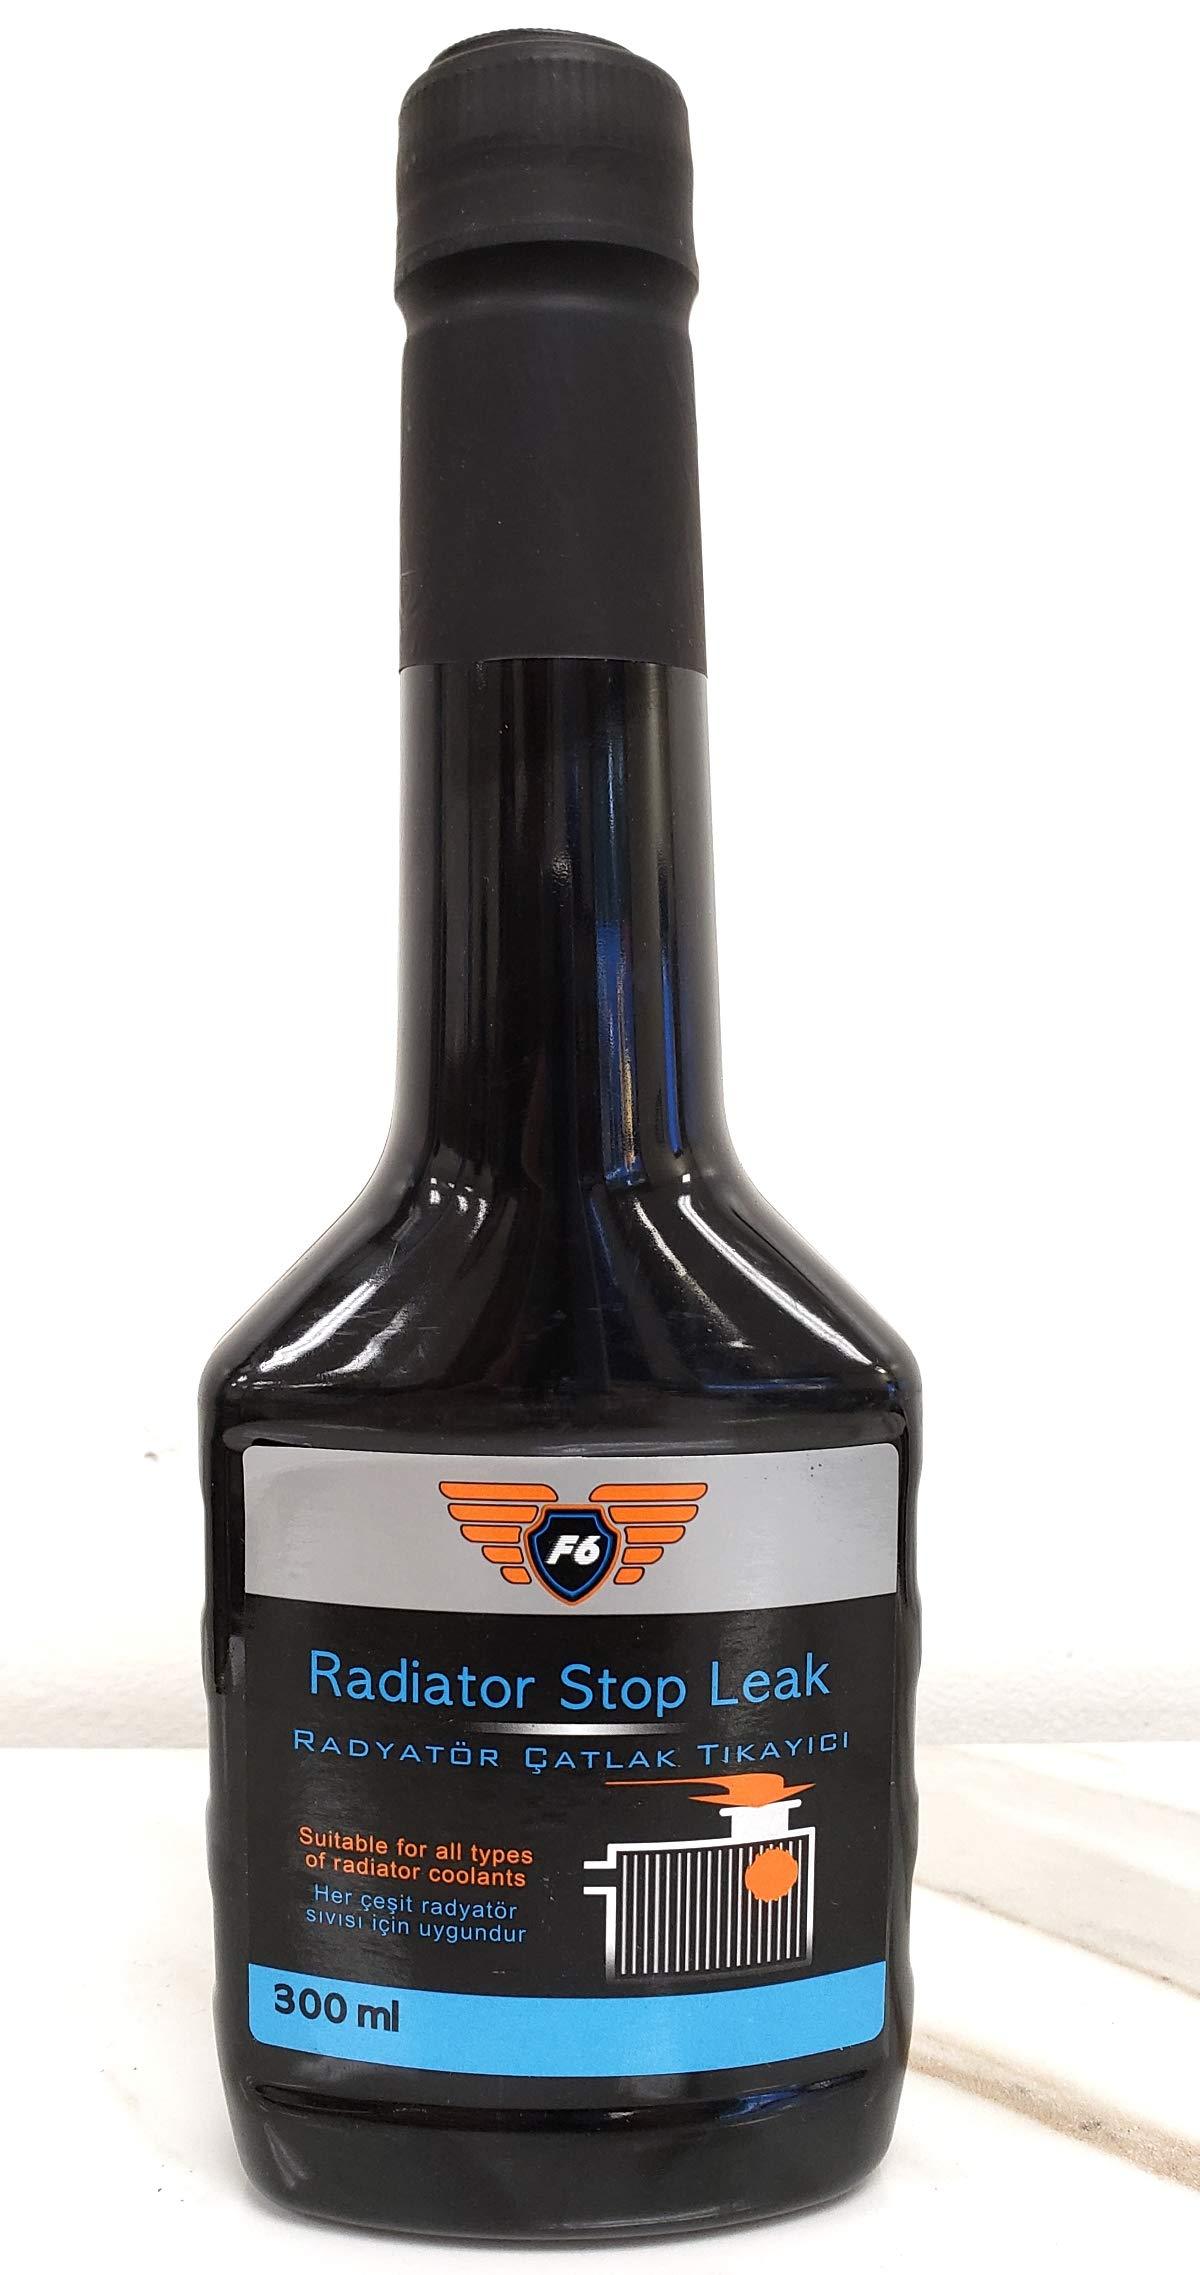 Speedol F6 Radiator Stop Leak Cooling System Sealer, 10.14 Oz (300 Ml) Bottle   Fixes Minor Leaks and Seepages in The Radiator by Speedol